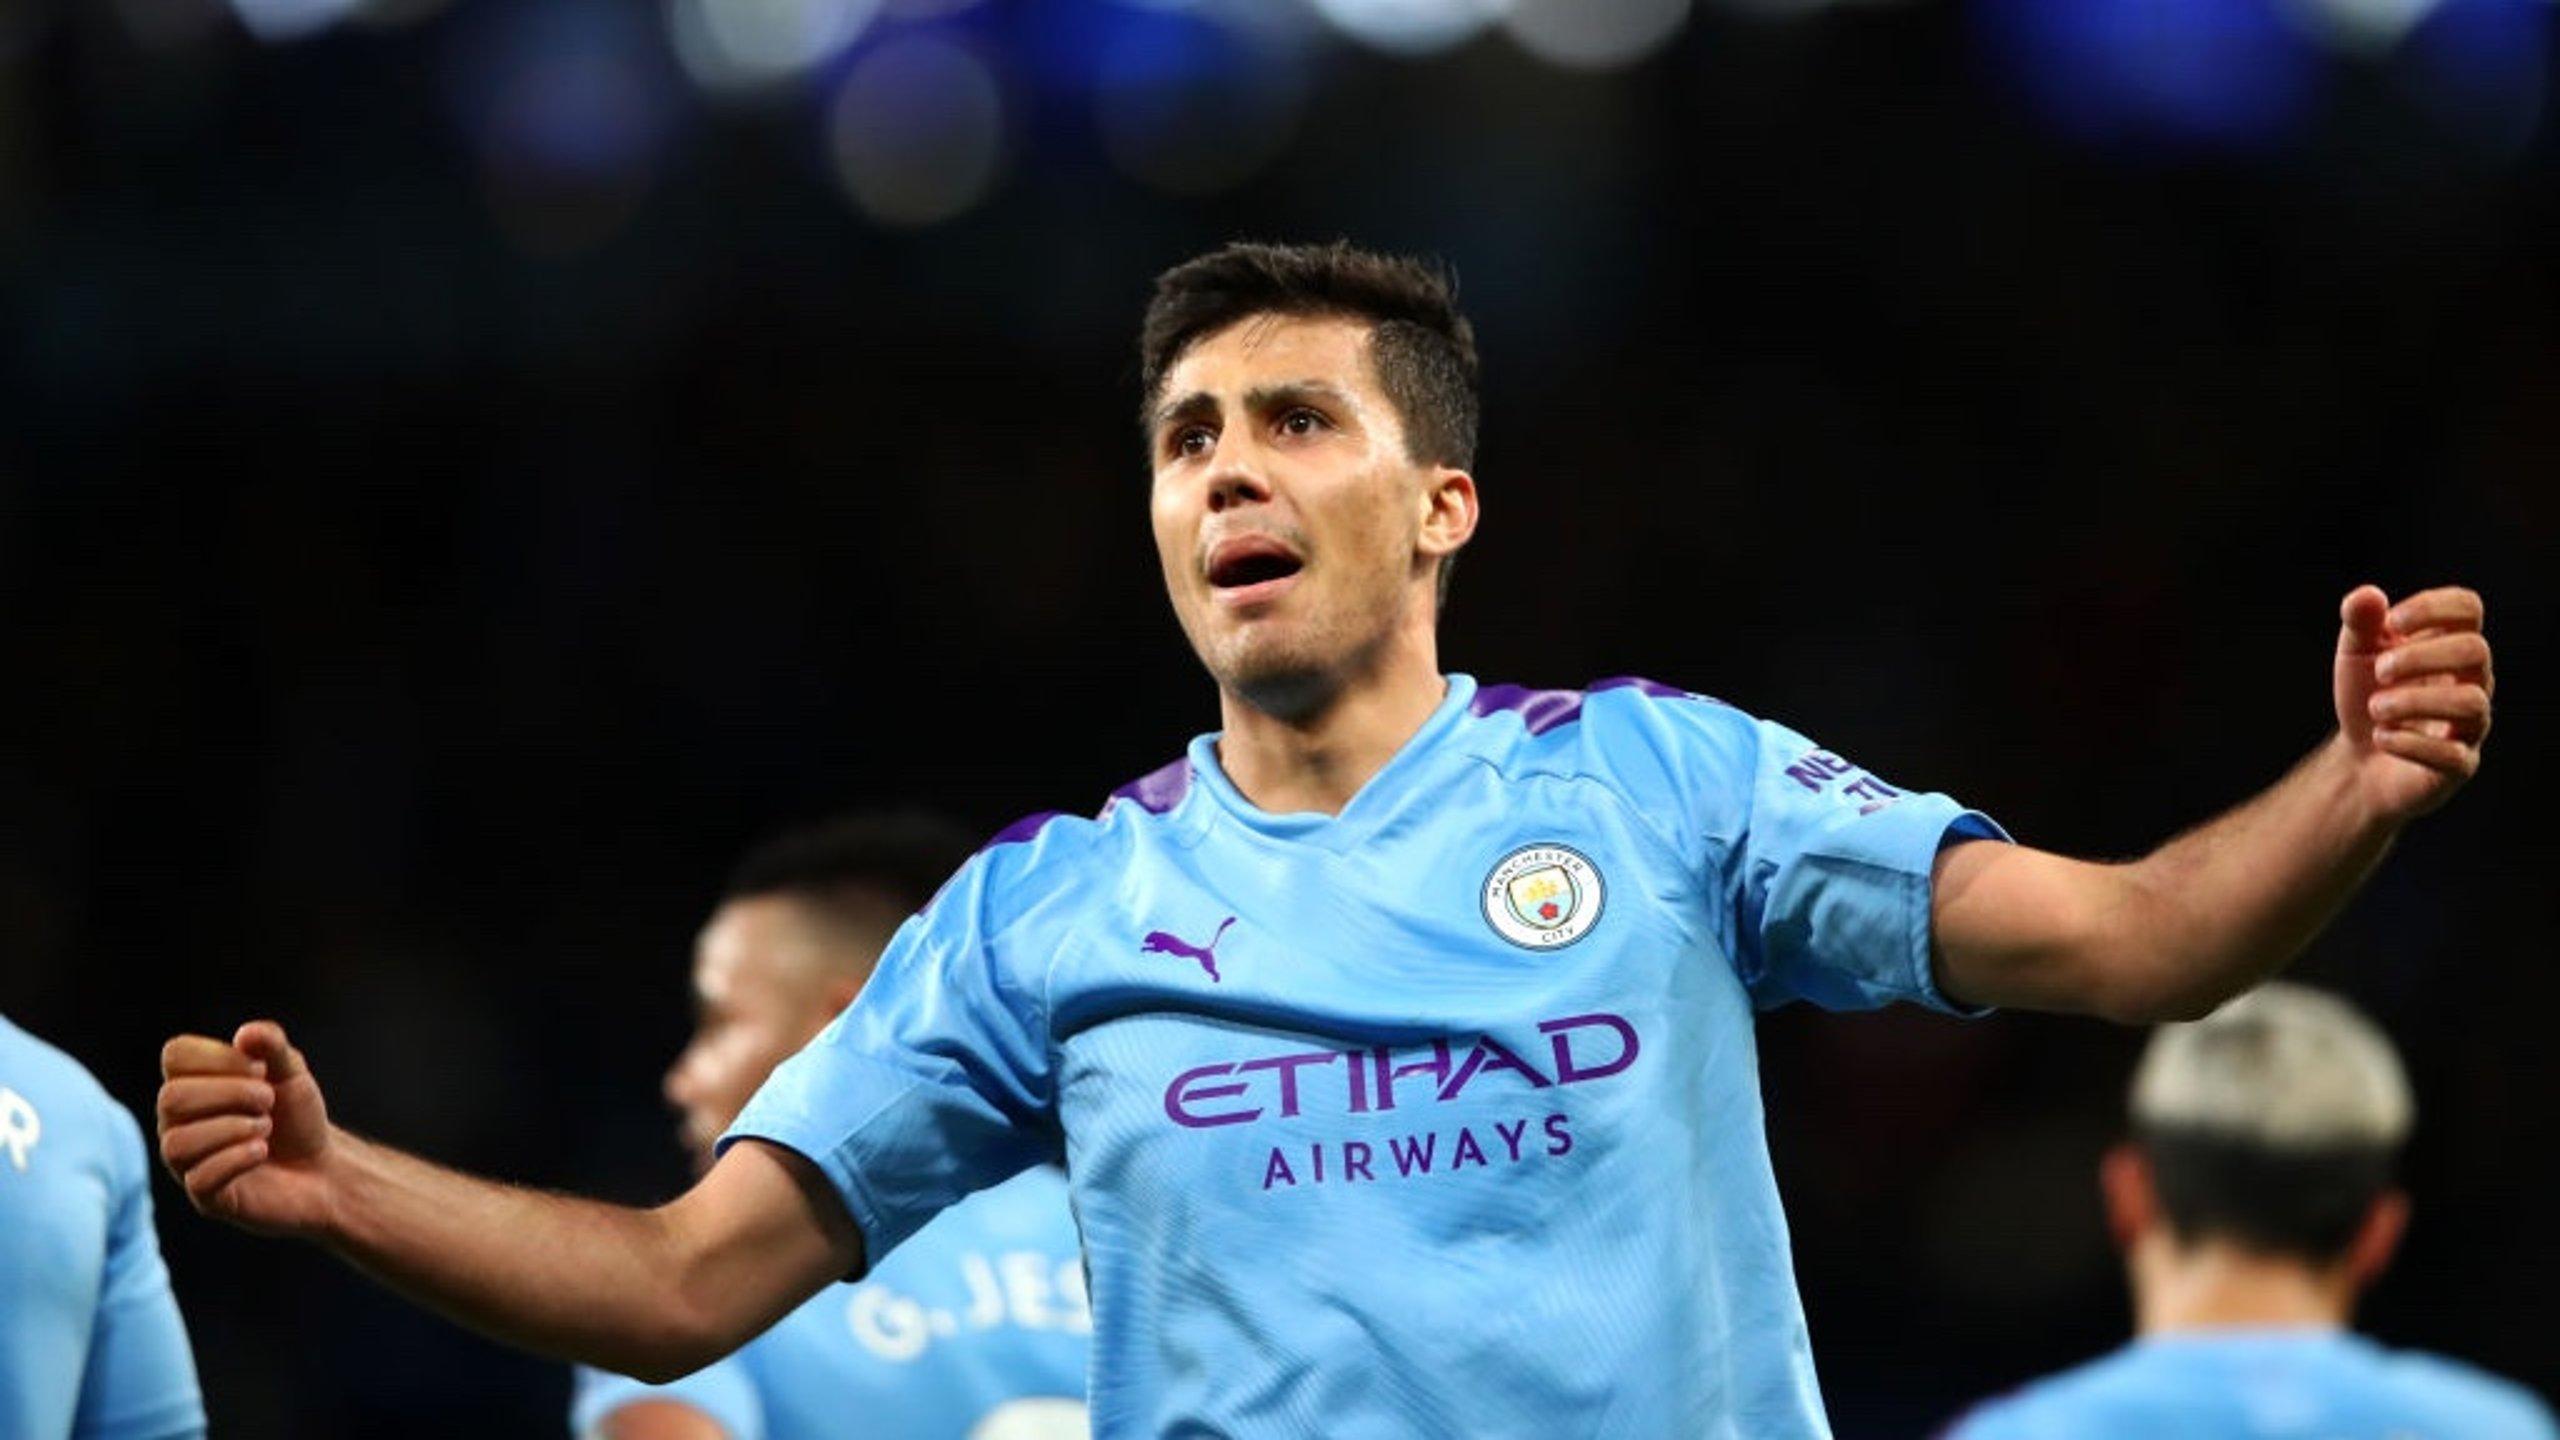 City ease back to winning ways against West Ham